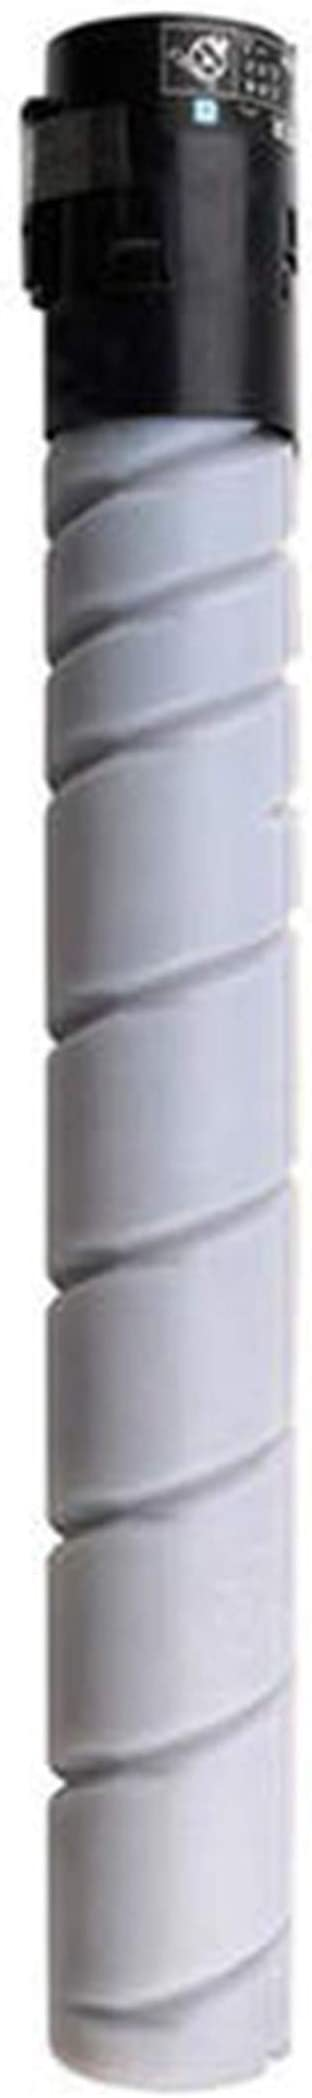 Original Konica Minolta A9E8250 TN514Y Toner gelb für C658 C558 C458